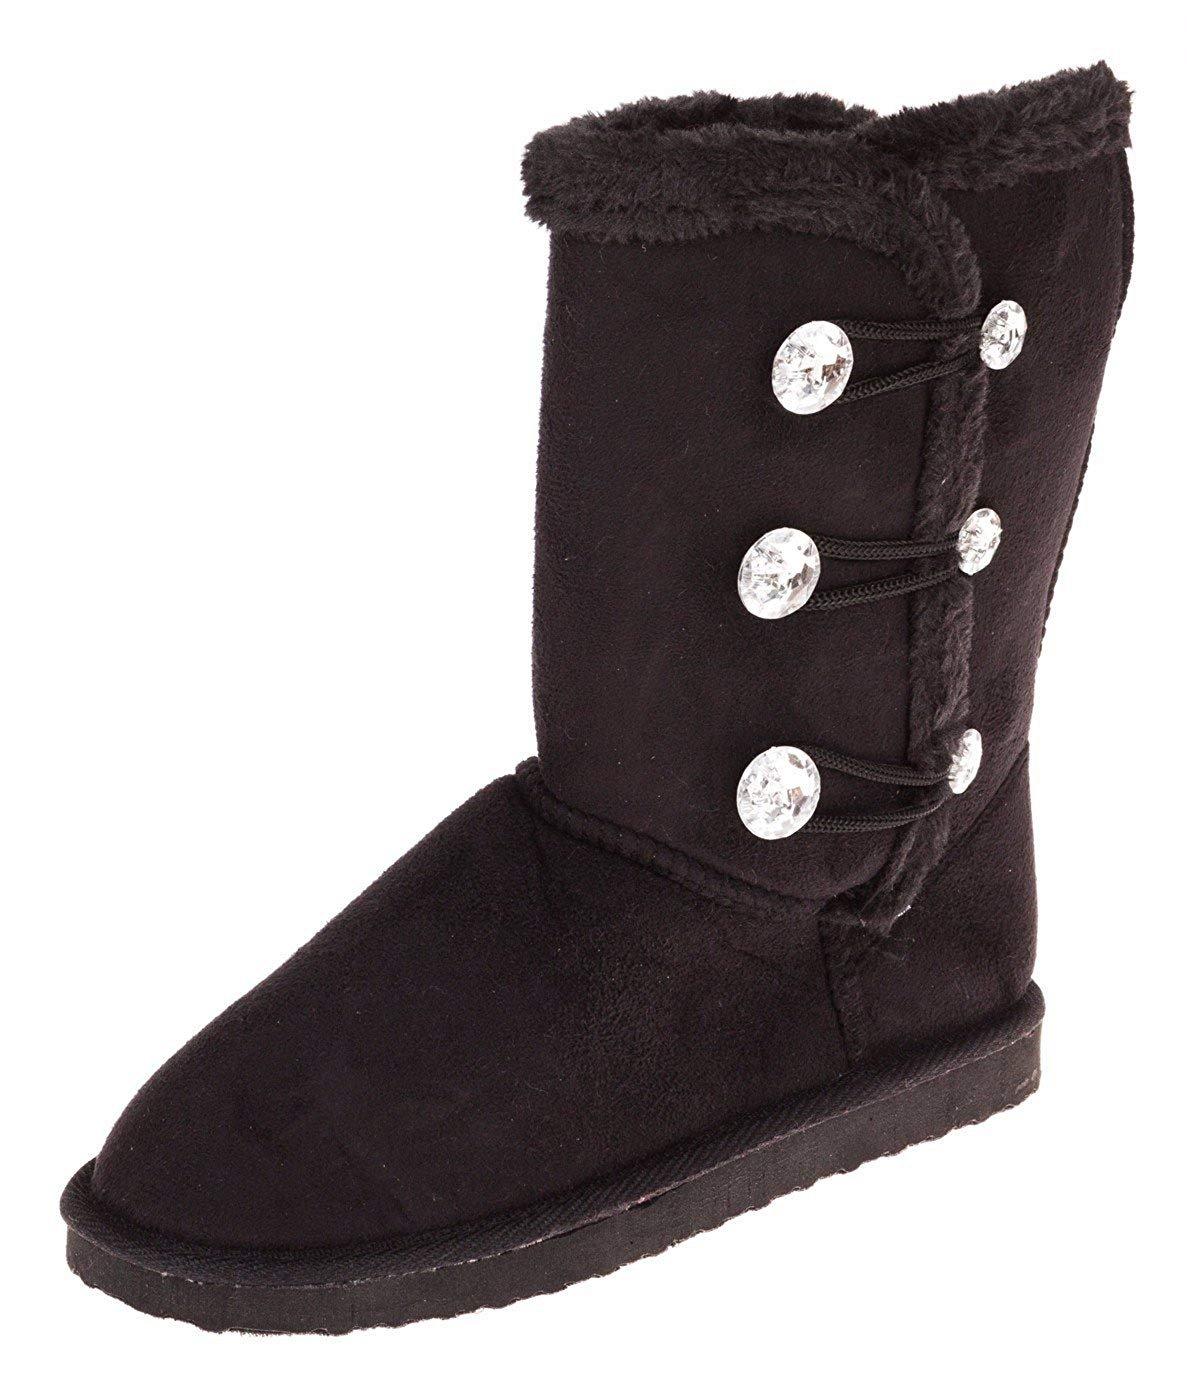 Chatties Girls 6 Inch Boot with Rhinestones